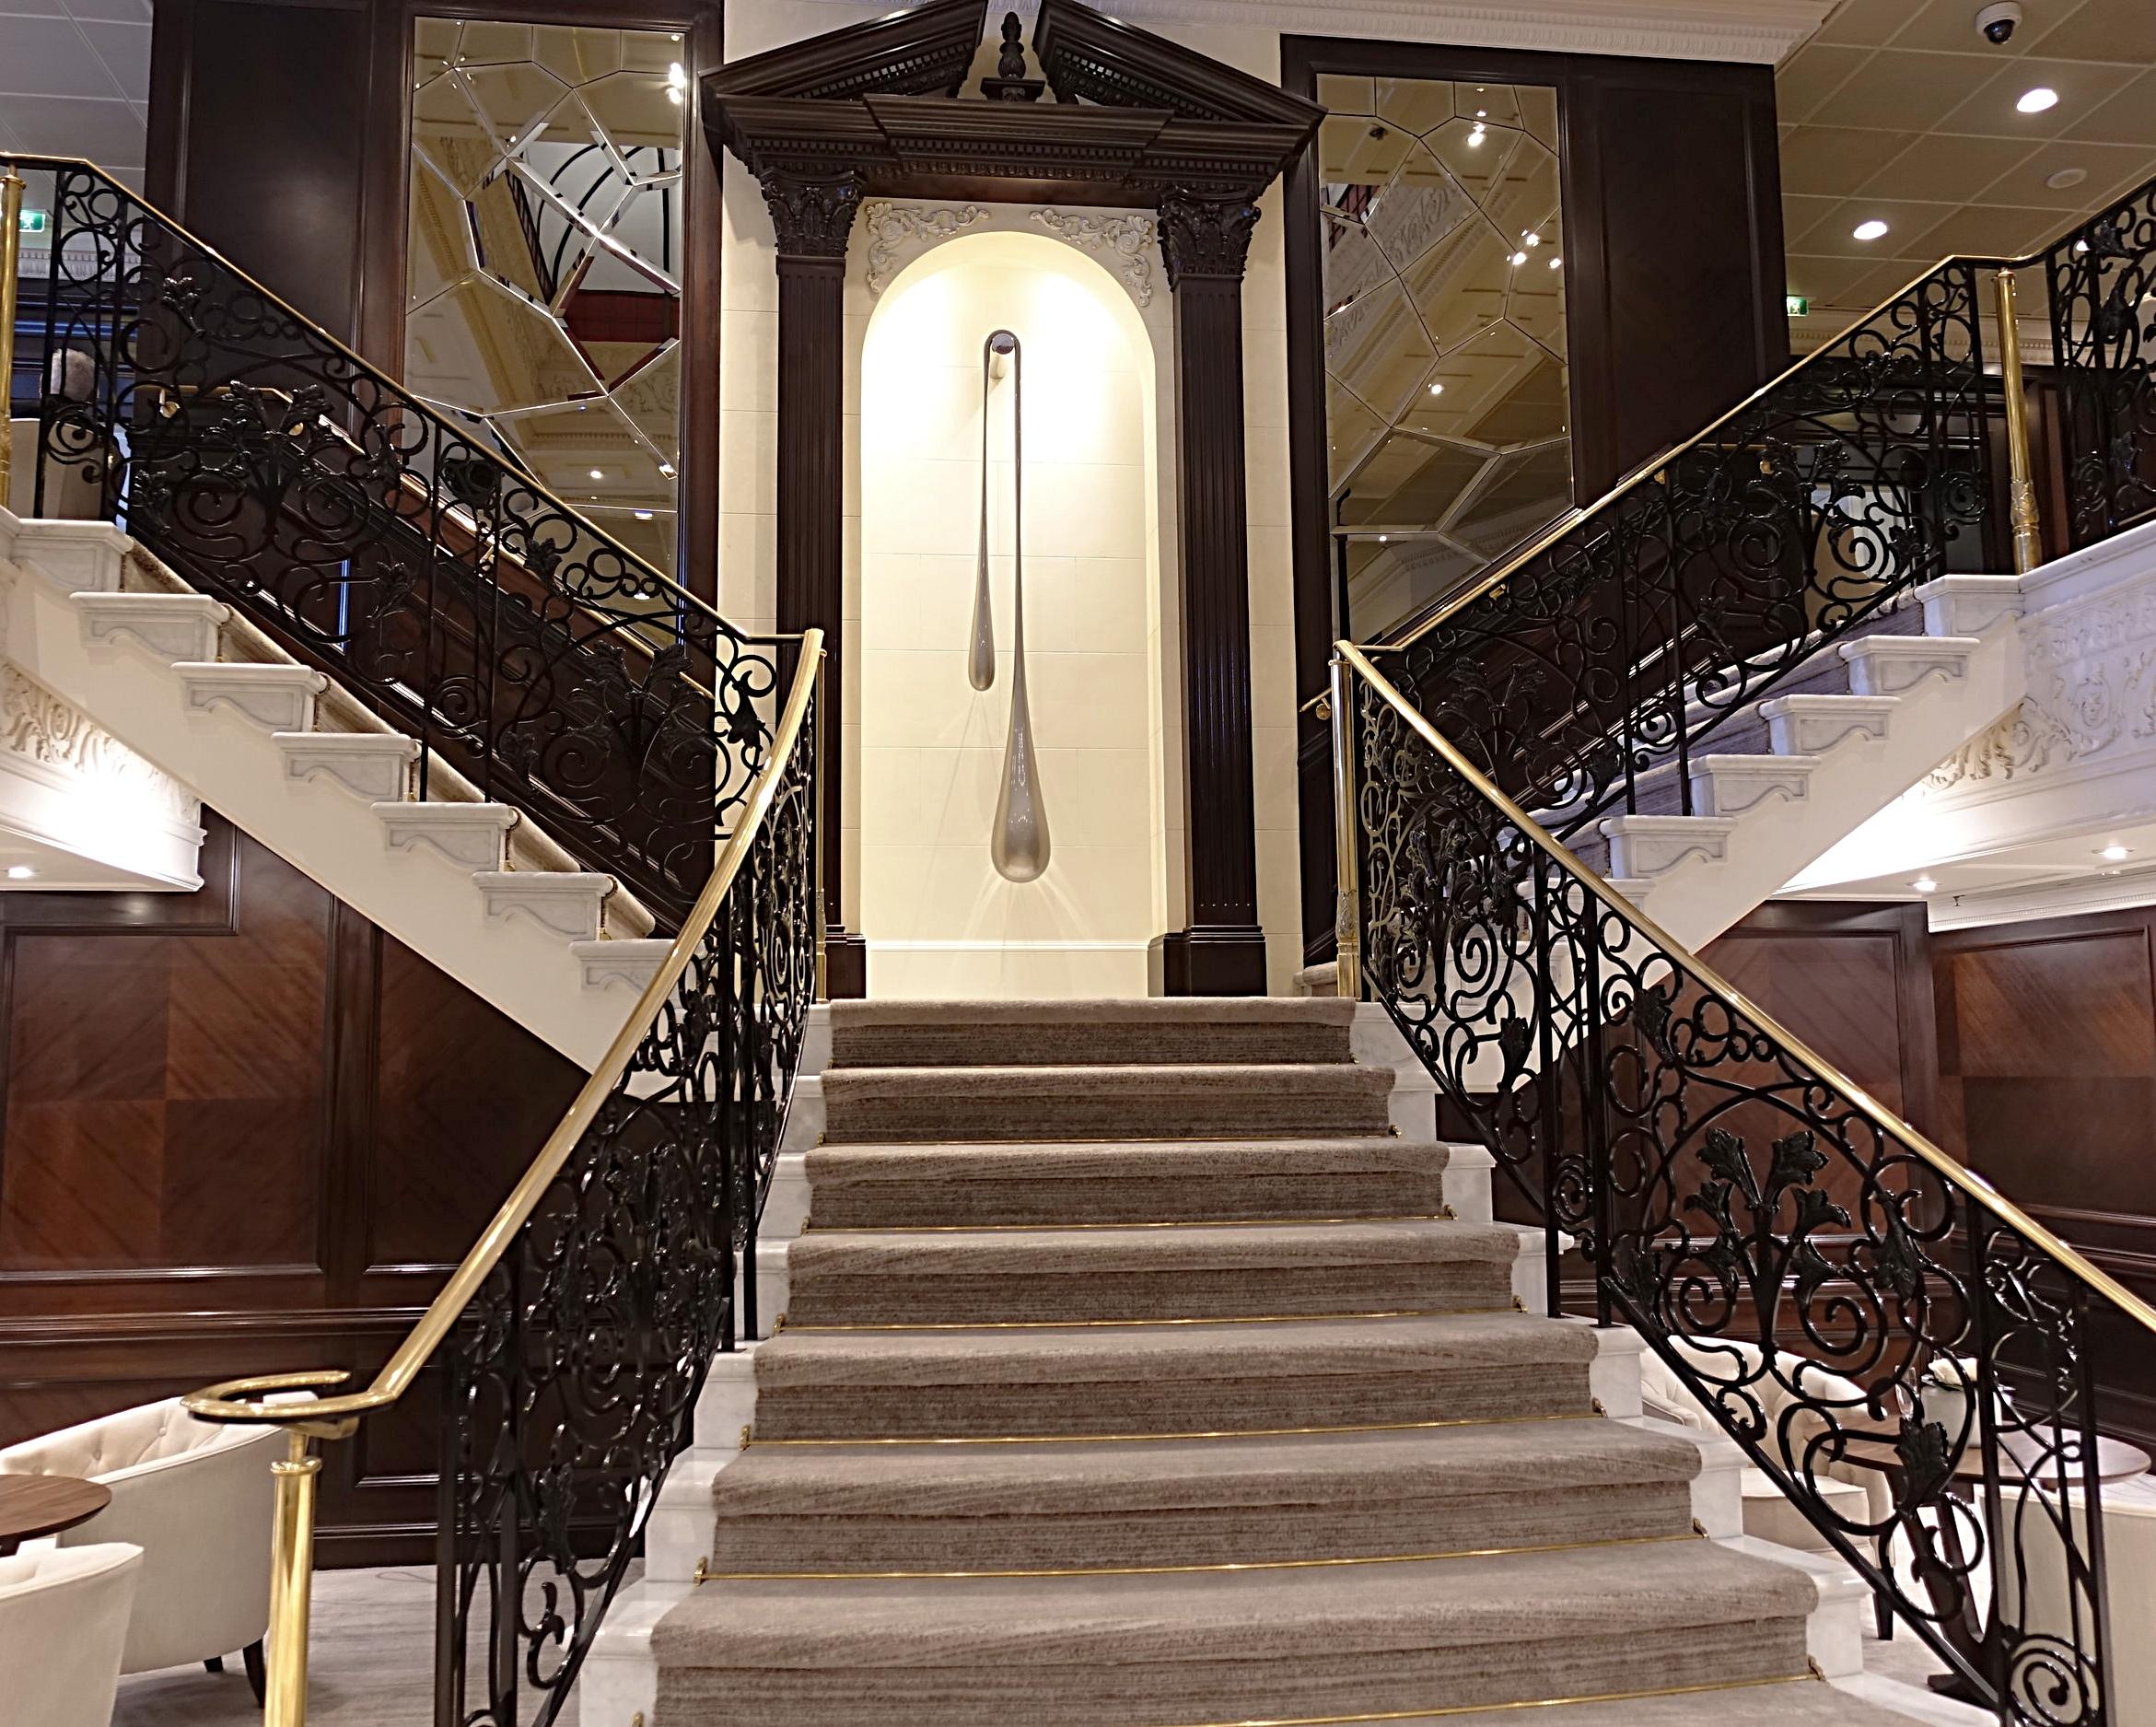 The elegant staircase in the main atrium.